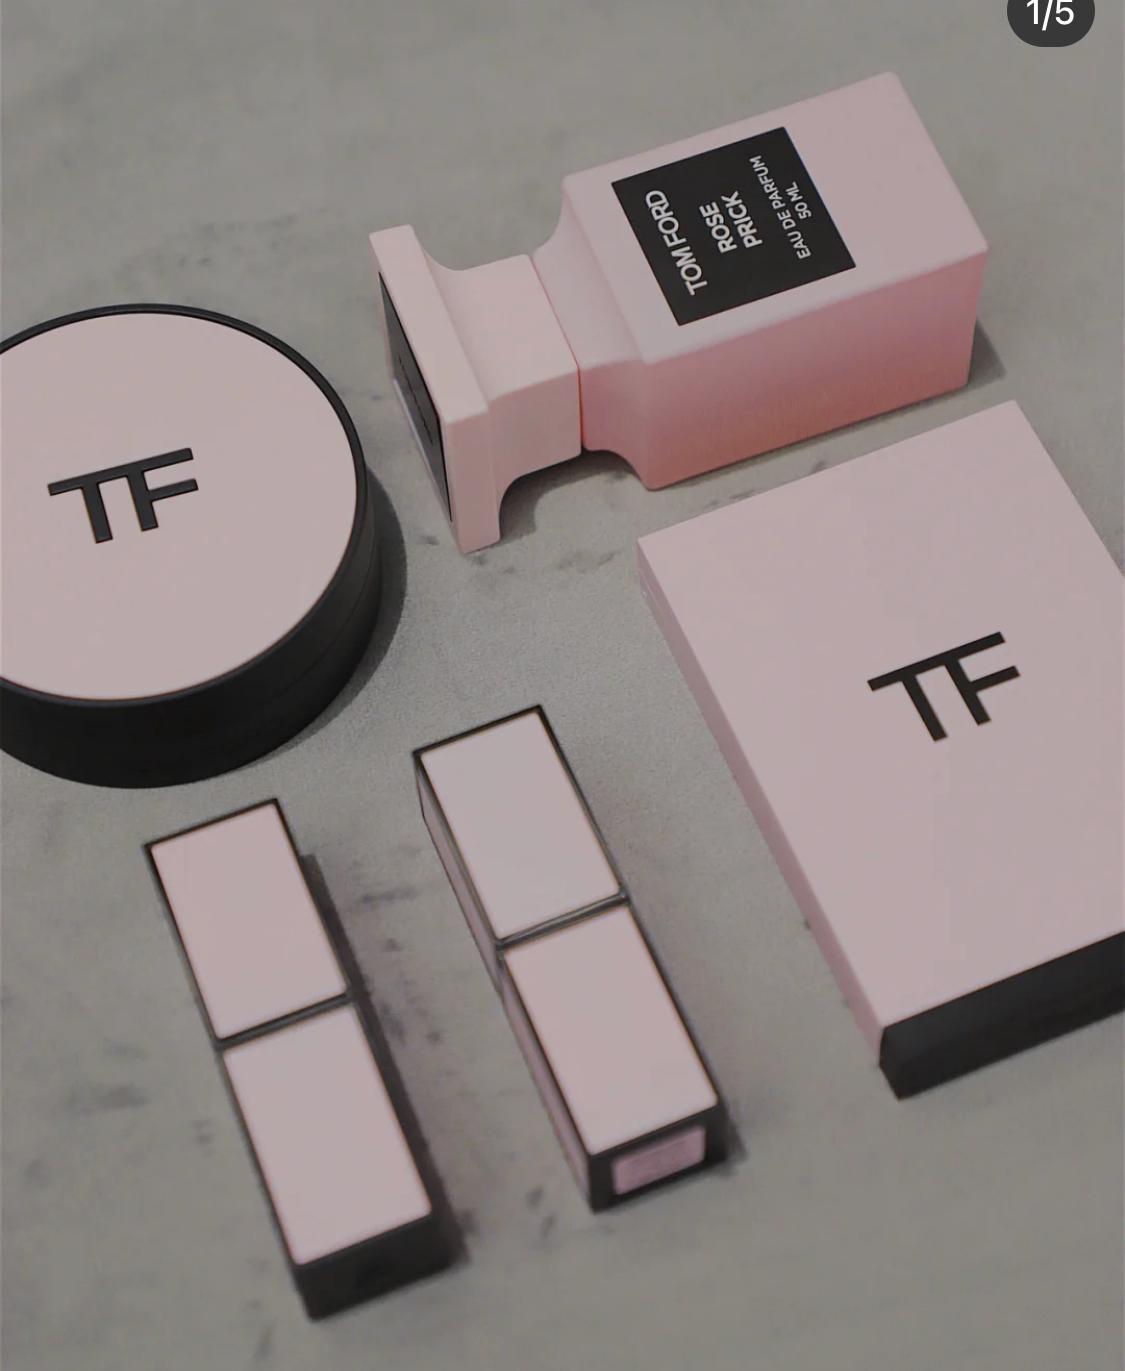 Louis美妝代購現貨Tom ford TF湯姆福特新粉白管粉色限量口紅眼影粉管03/26 04